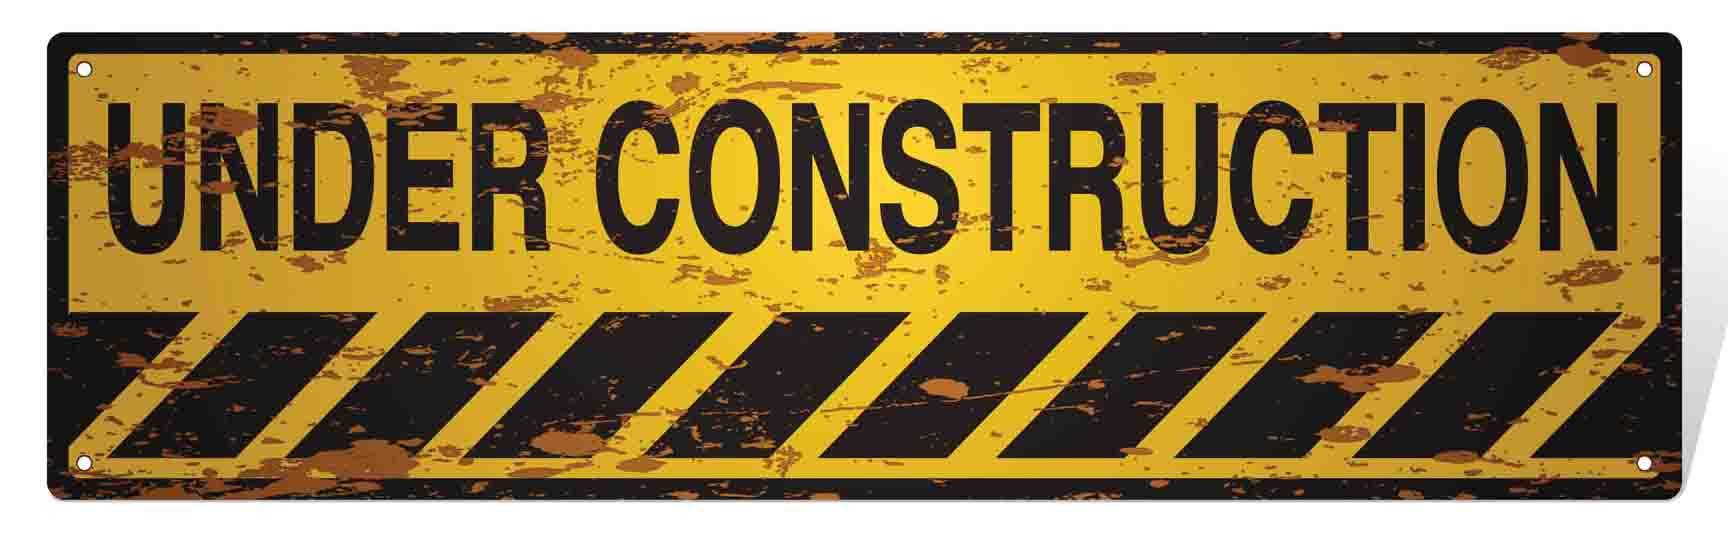 Under construction sign1